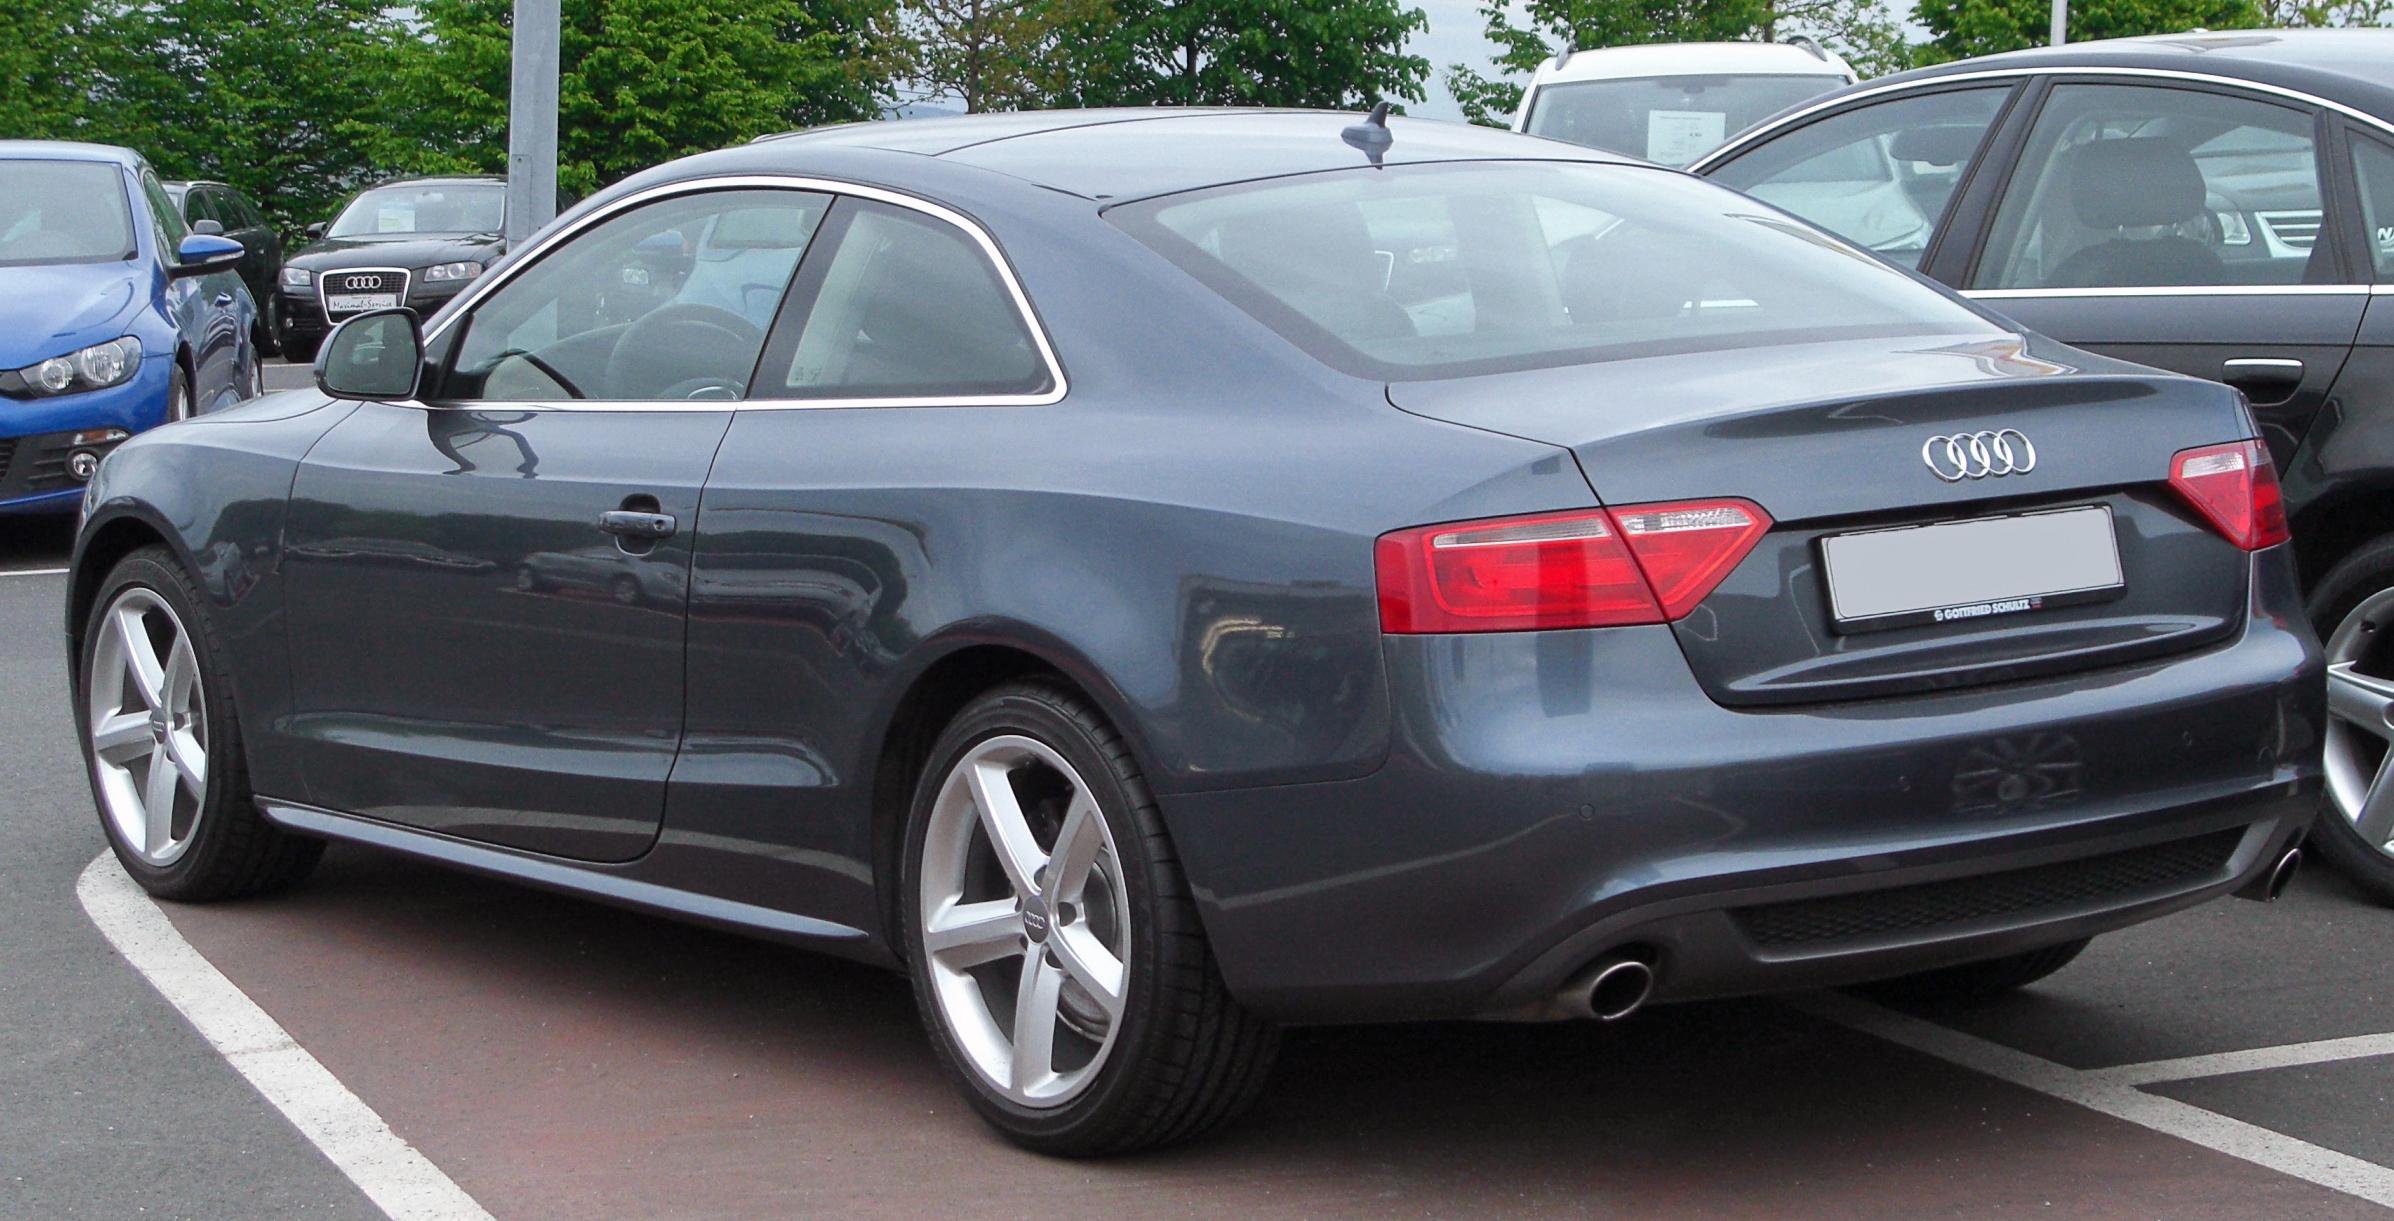 Kelebihan Audi A5 Coupe 2010 Perbandingan Harga